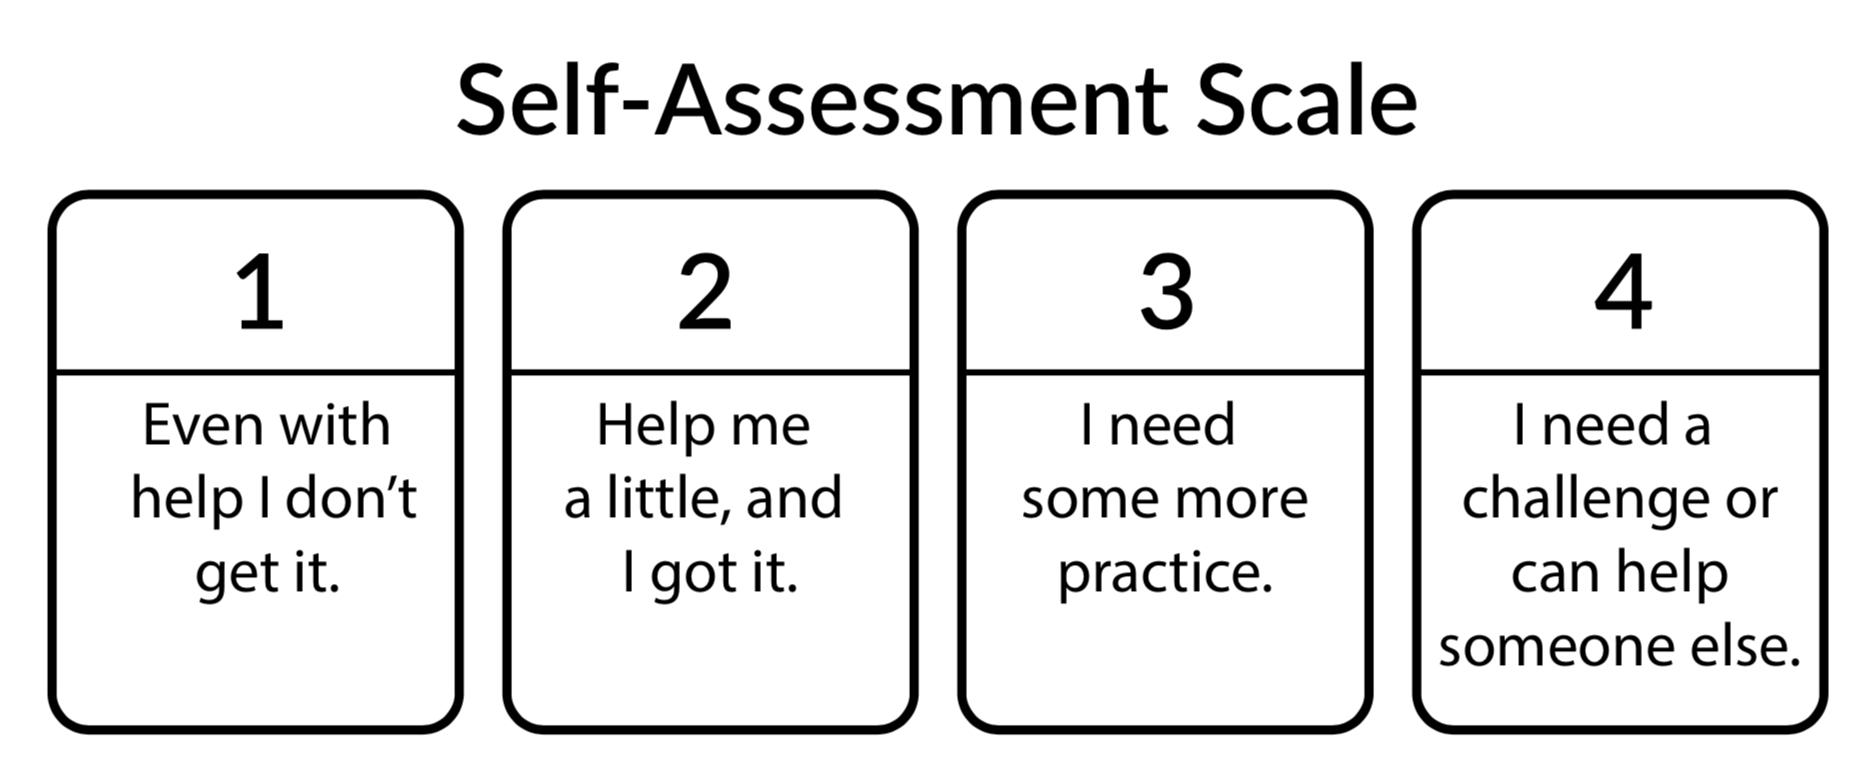 Printable Worksheets For Teachers (K-12) - Teachervision | 4Th Grade Health Printable Worksheets